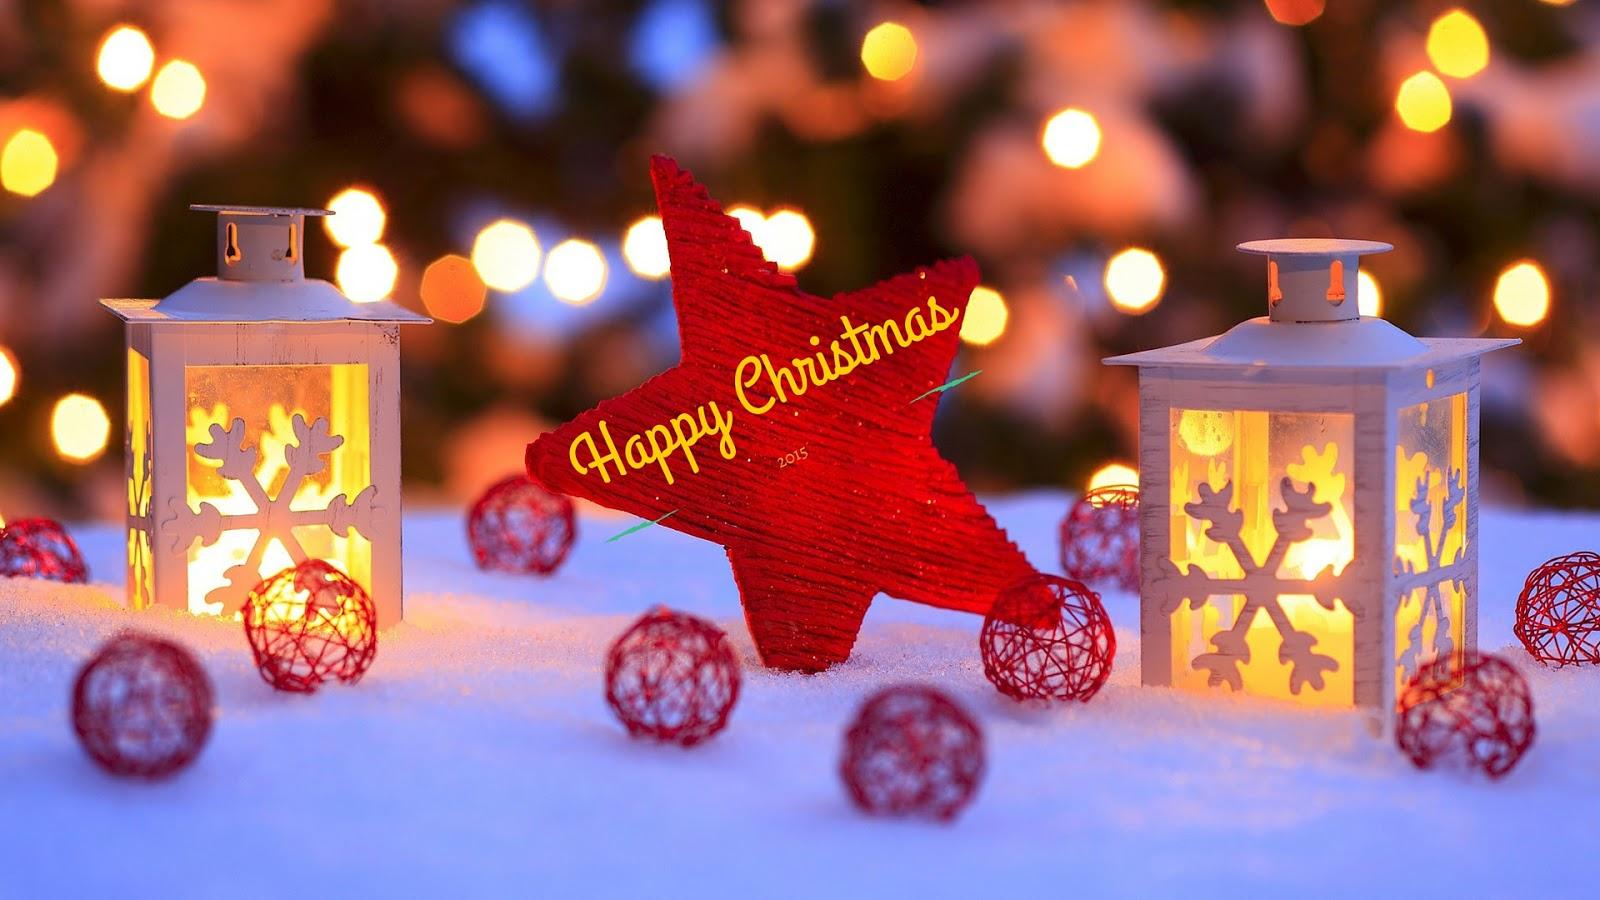 Star In Snow Christmas HD Wallaper